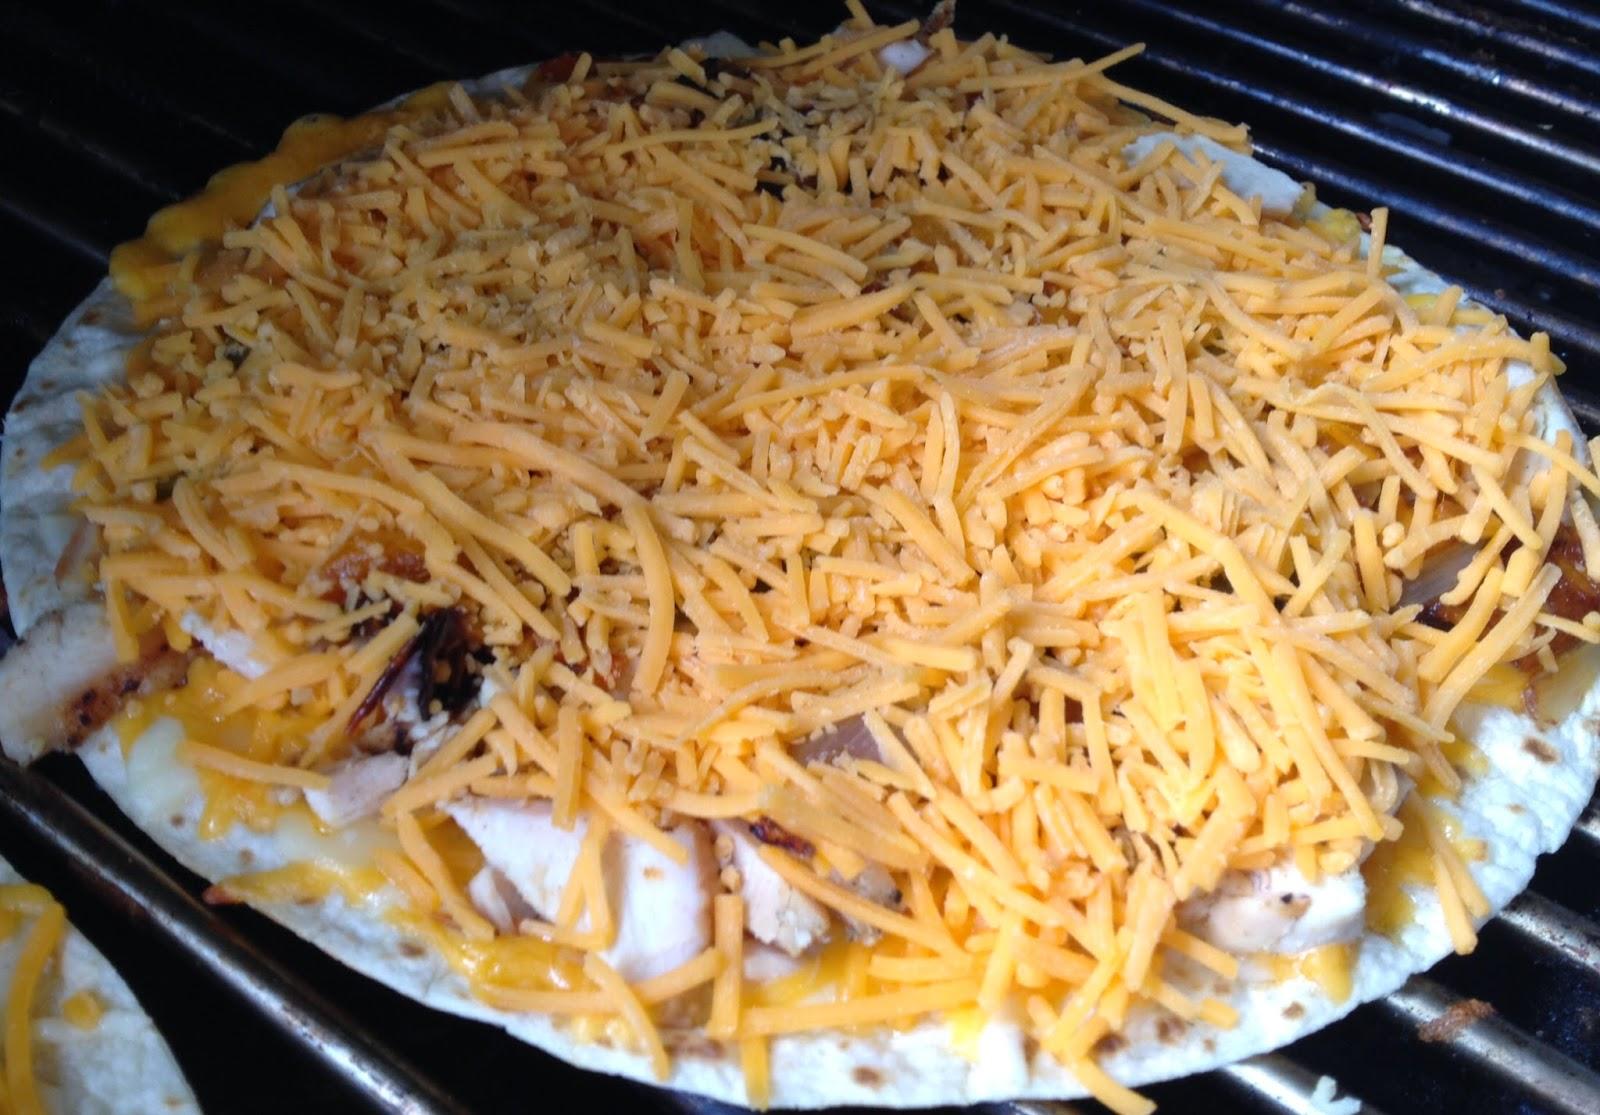 Keep an eye on the bottom tortilla, when it's crispy,